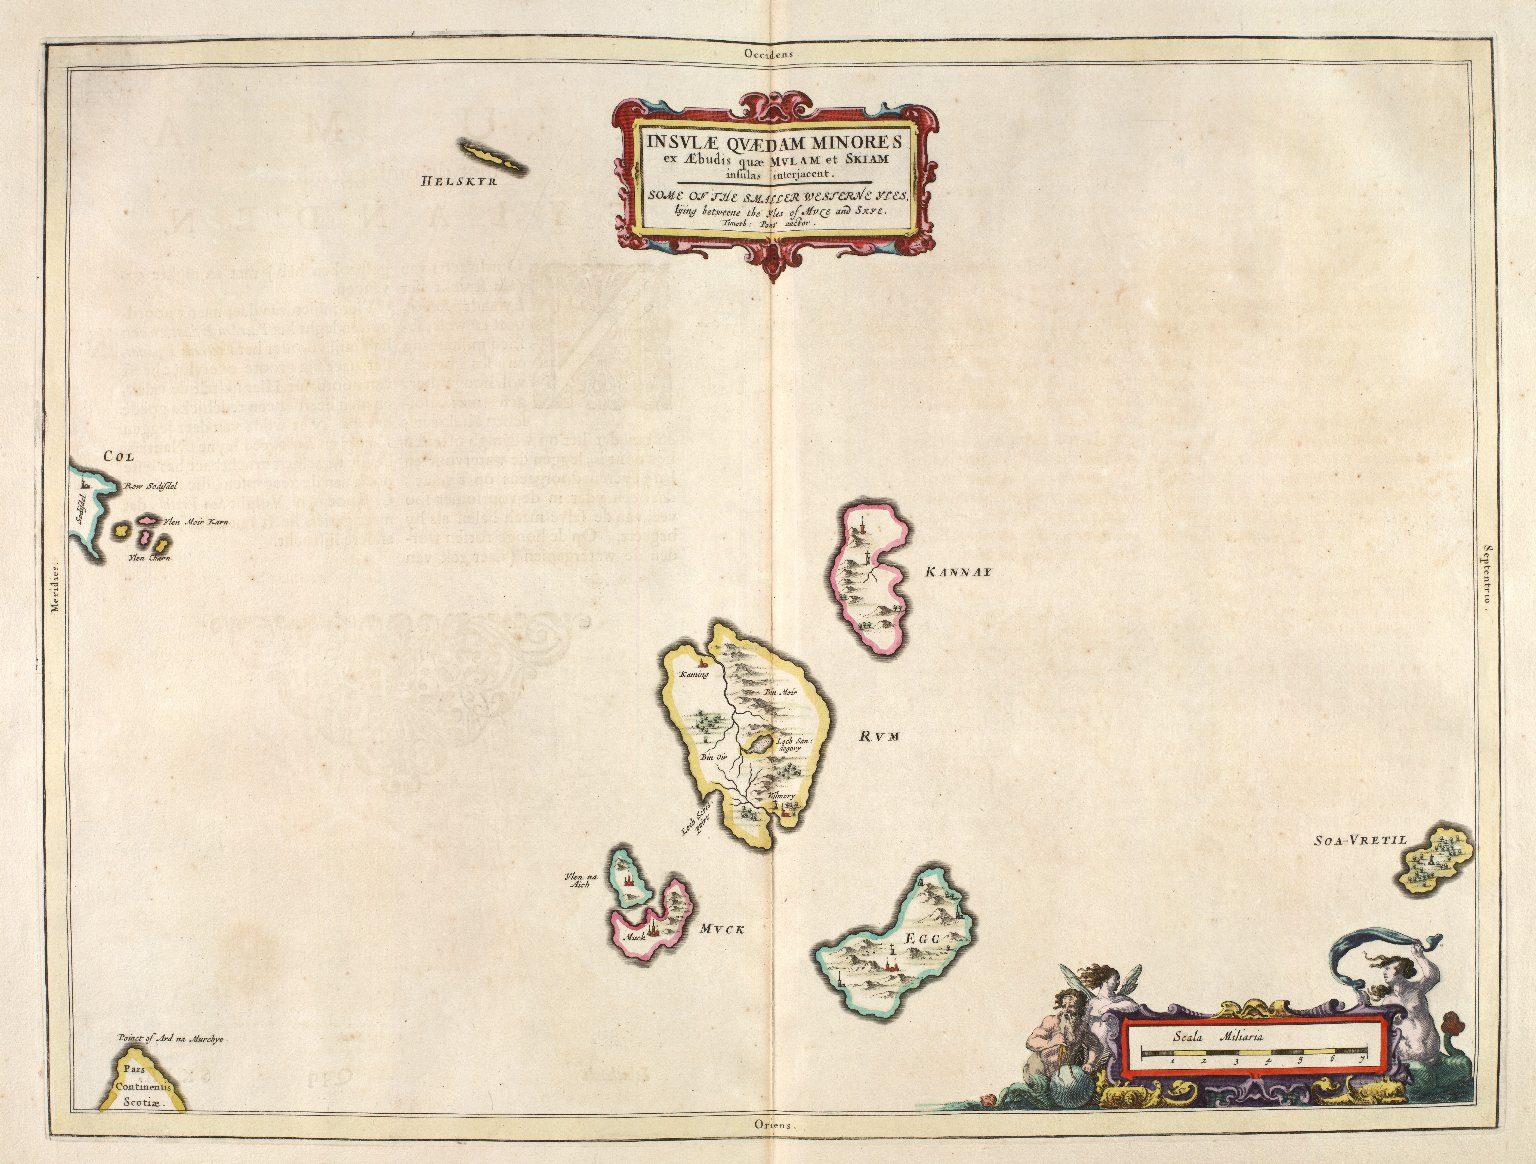 Insulæ Quædam Minores ex Æbudis quæ Mulam et Skiam insulas interjacent. Some of the Smaller Westerne Yles, lying betweene the Yles of Mule and Skye. [1 of 1]